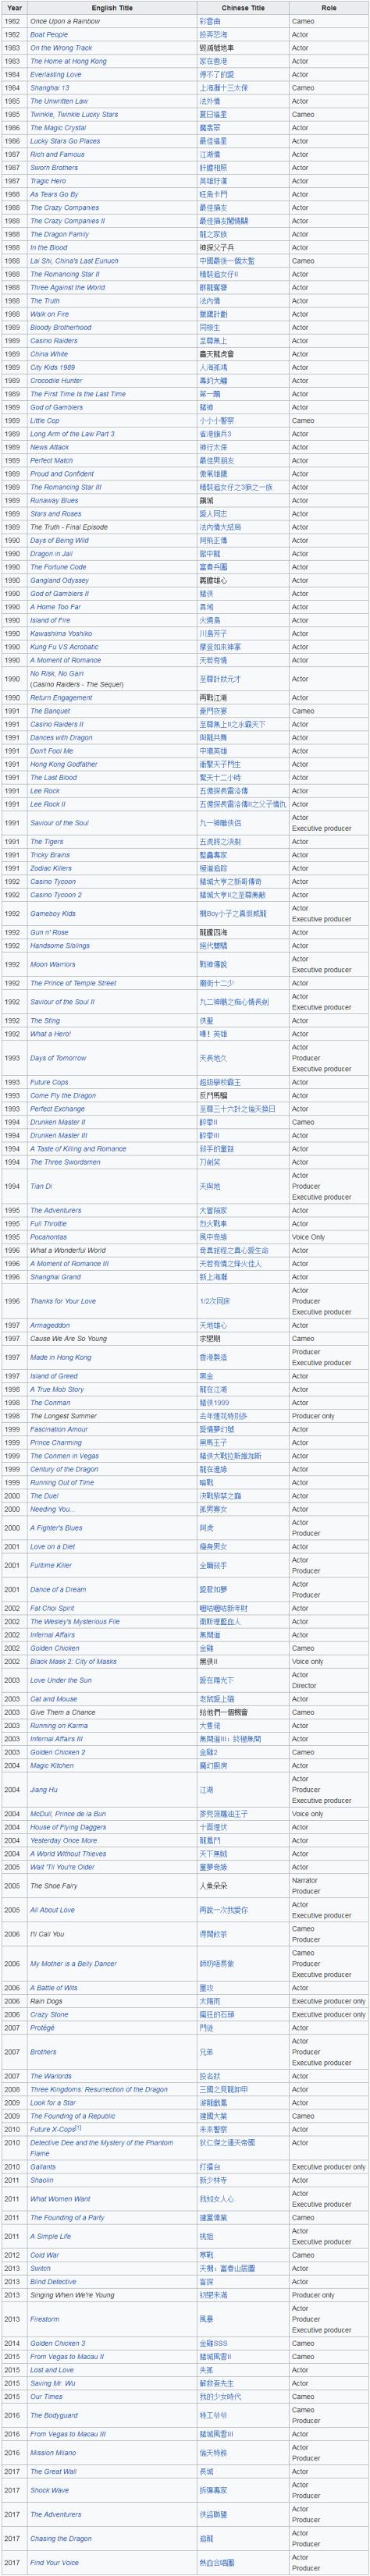 Opera Snapshot_2017-12-03_163305_en.wikipedia.org